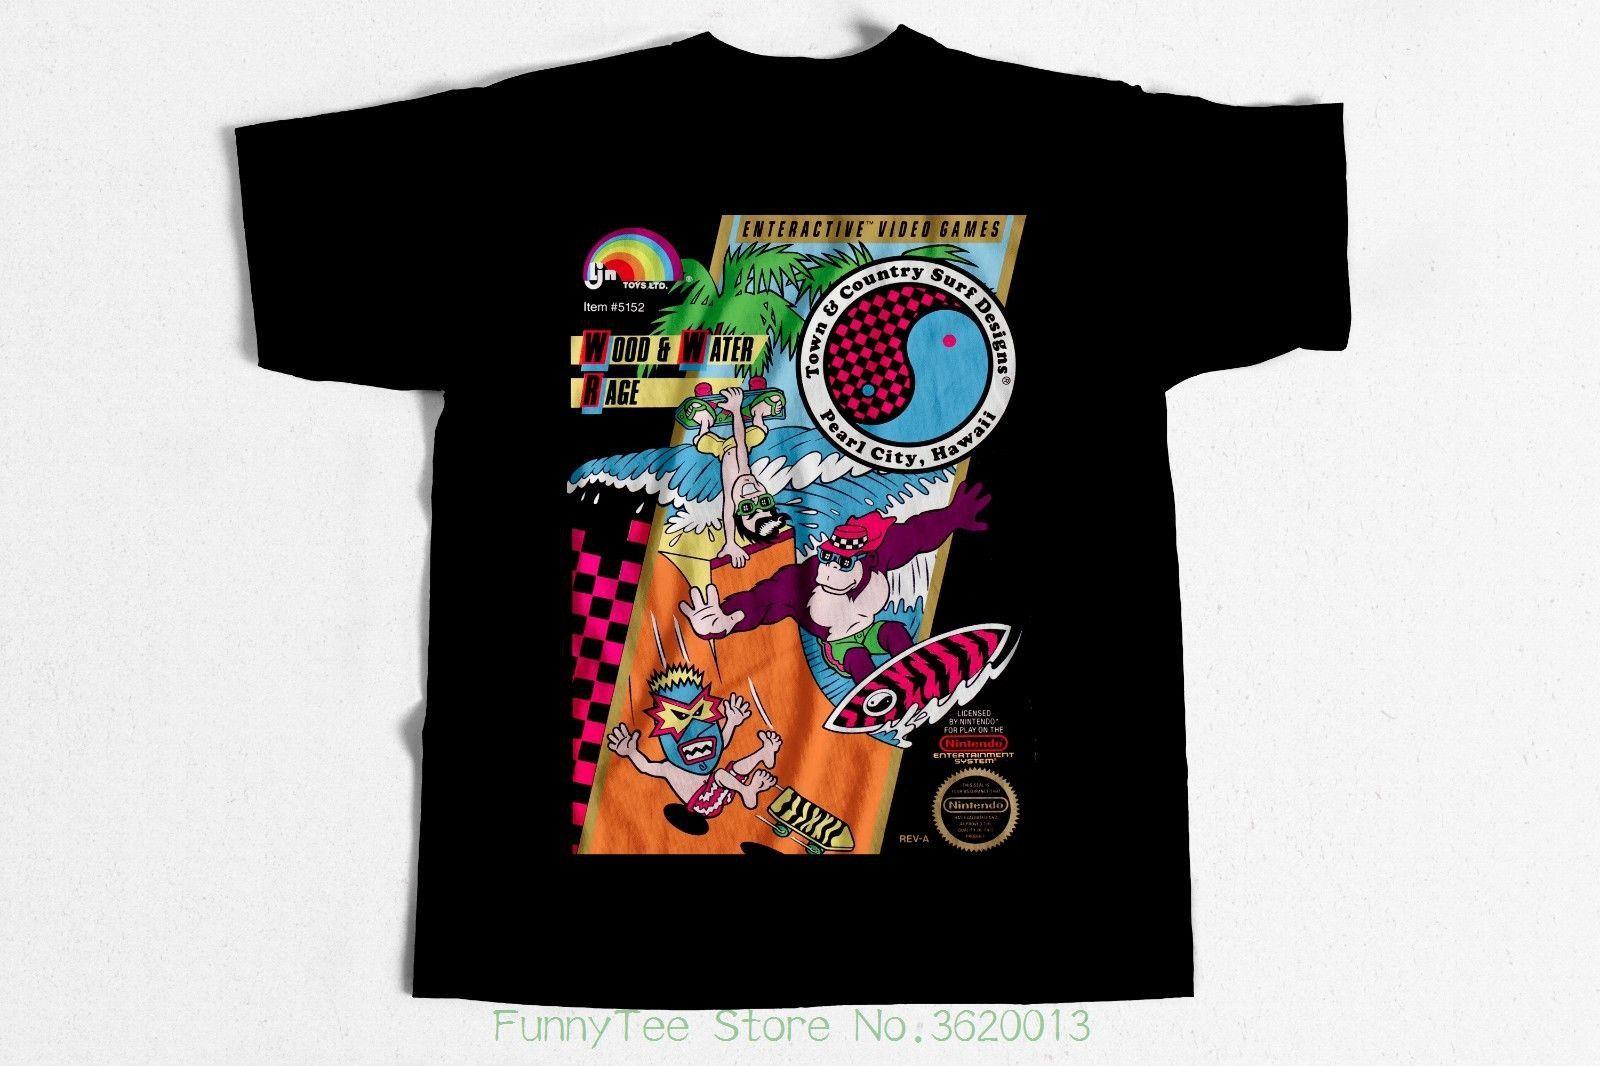 941e5ec039c Vintage Skate Surfer T Shirt Da Boys Nintendogame 80s Surfer Skateboard  Best Tee Shirts T Shirts Cheap From Funnyteestore